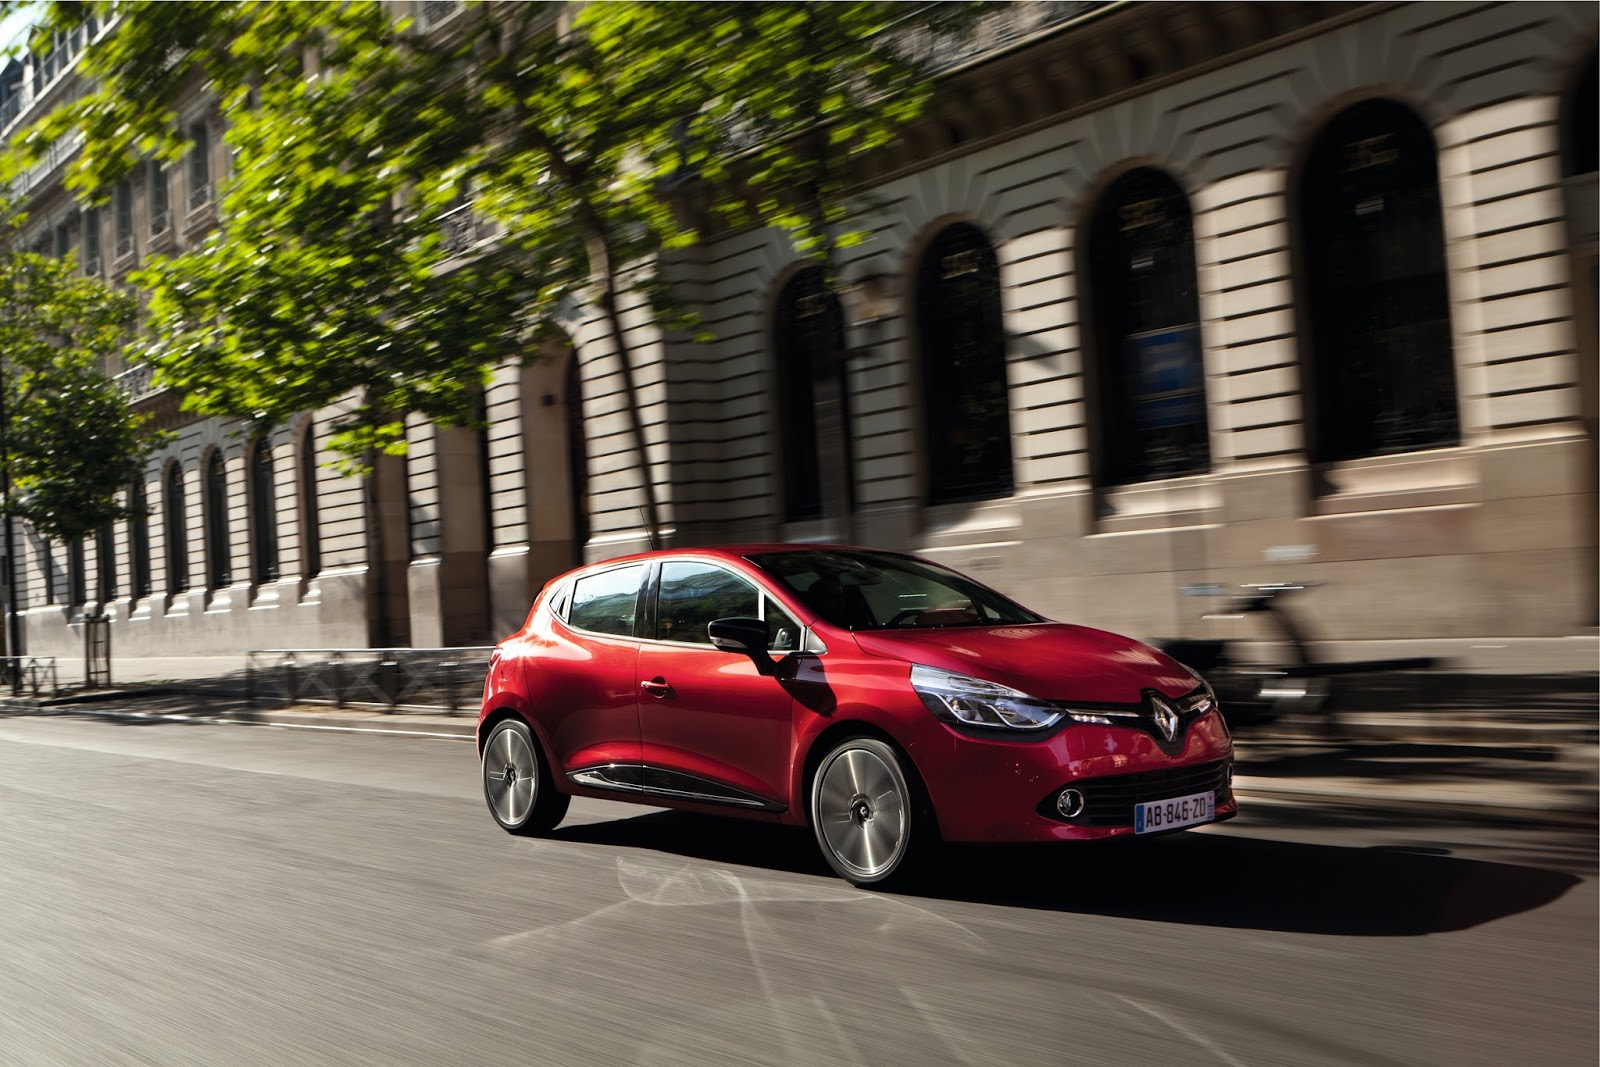 clio Ήρθε το Renault Clio με κινητήρες Euro 6 και χωρίς τέλη κυκλοφορίας